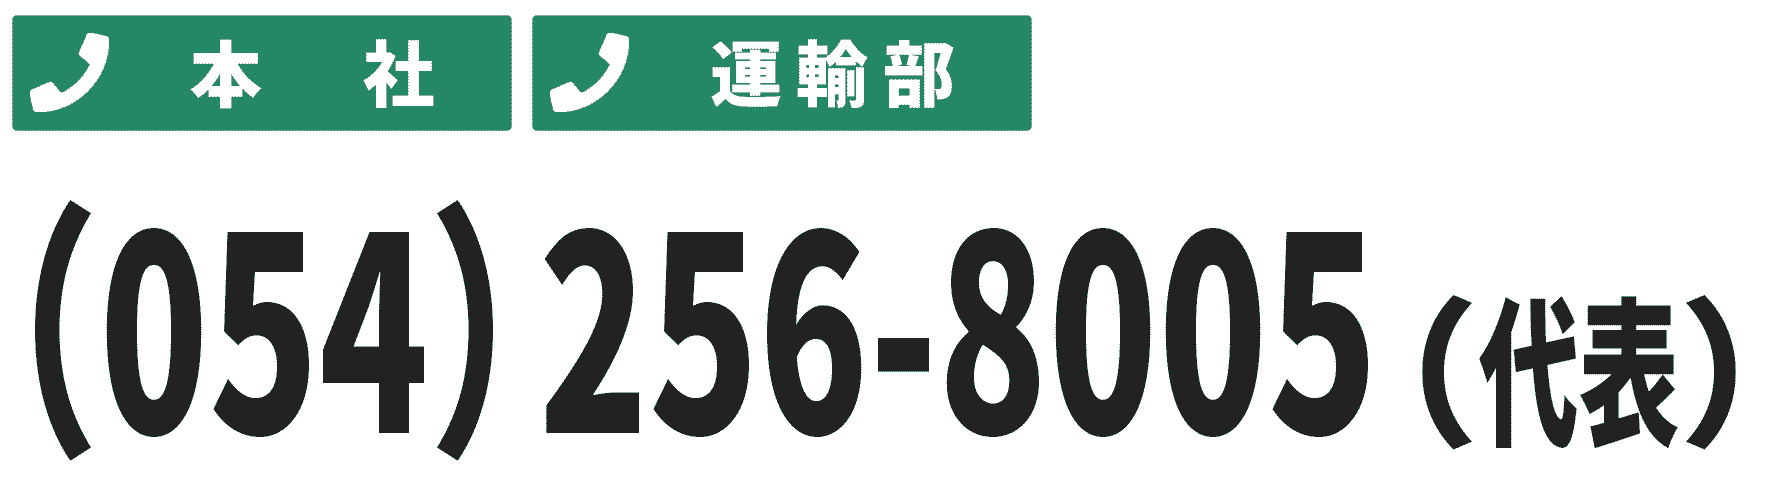 本社tel:054-256-8005(代)